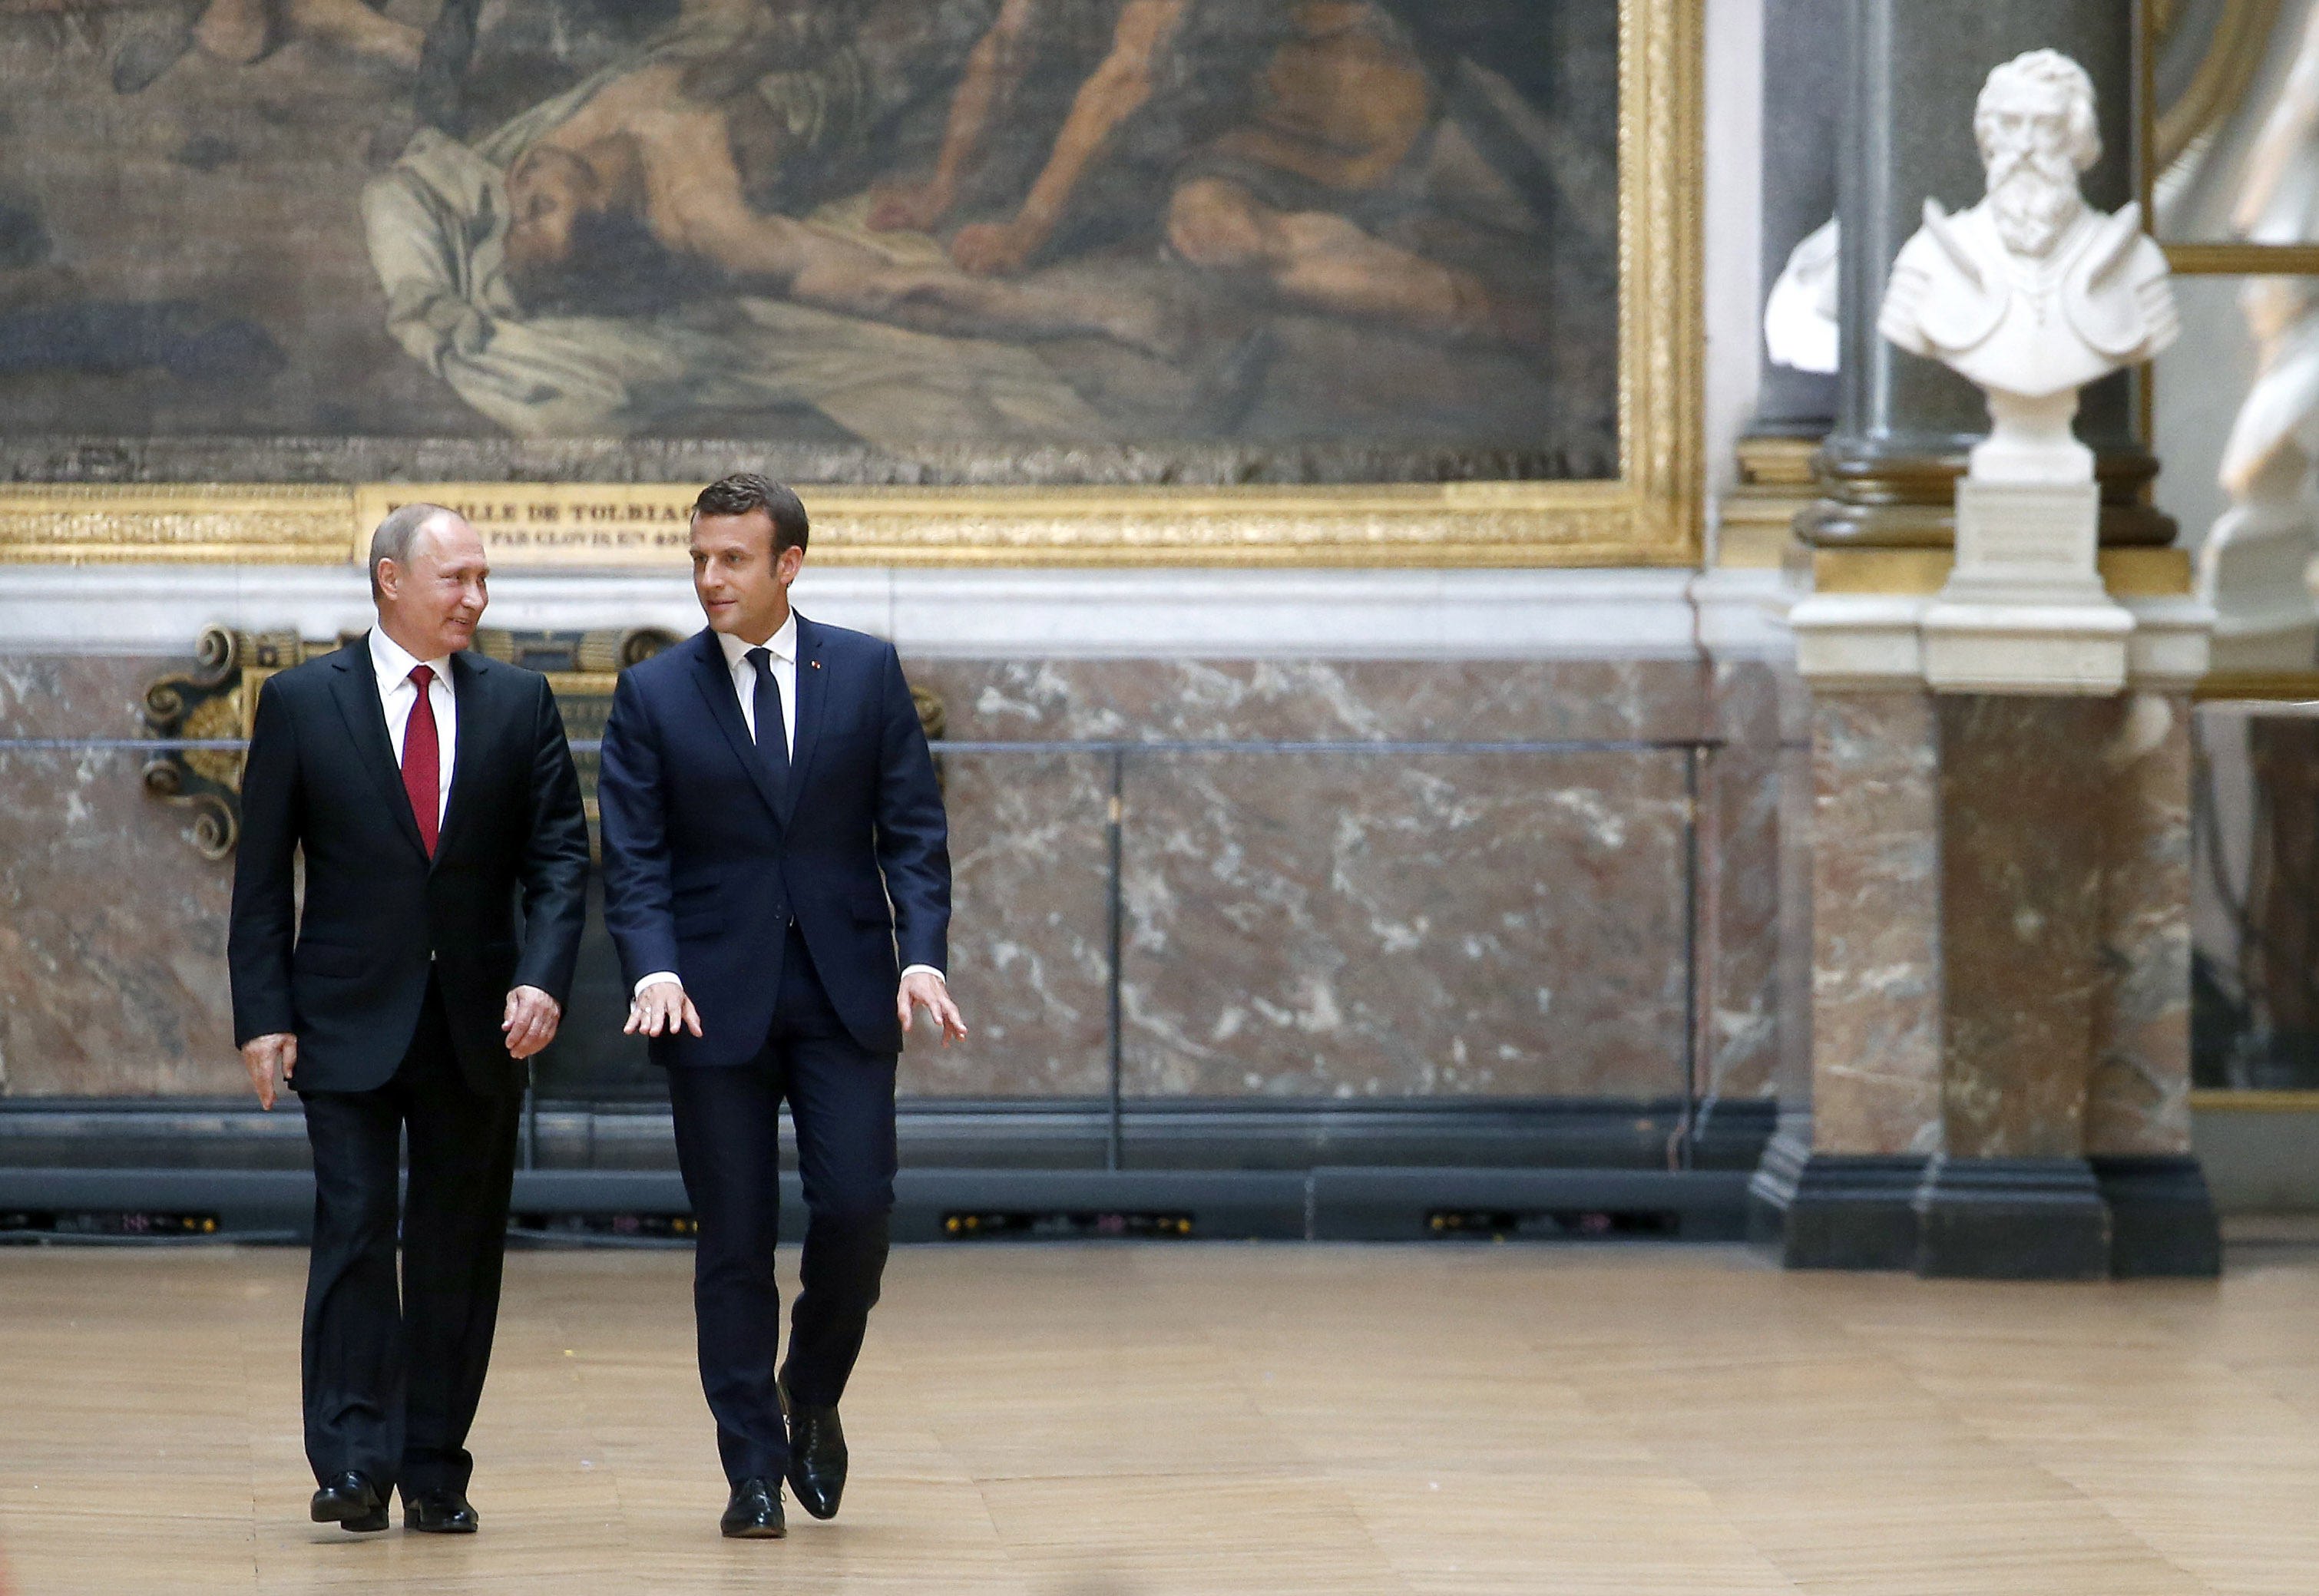 French President Emmanuel Macron Receives Vladimir Putin, Russian President At Chateau De Versailles